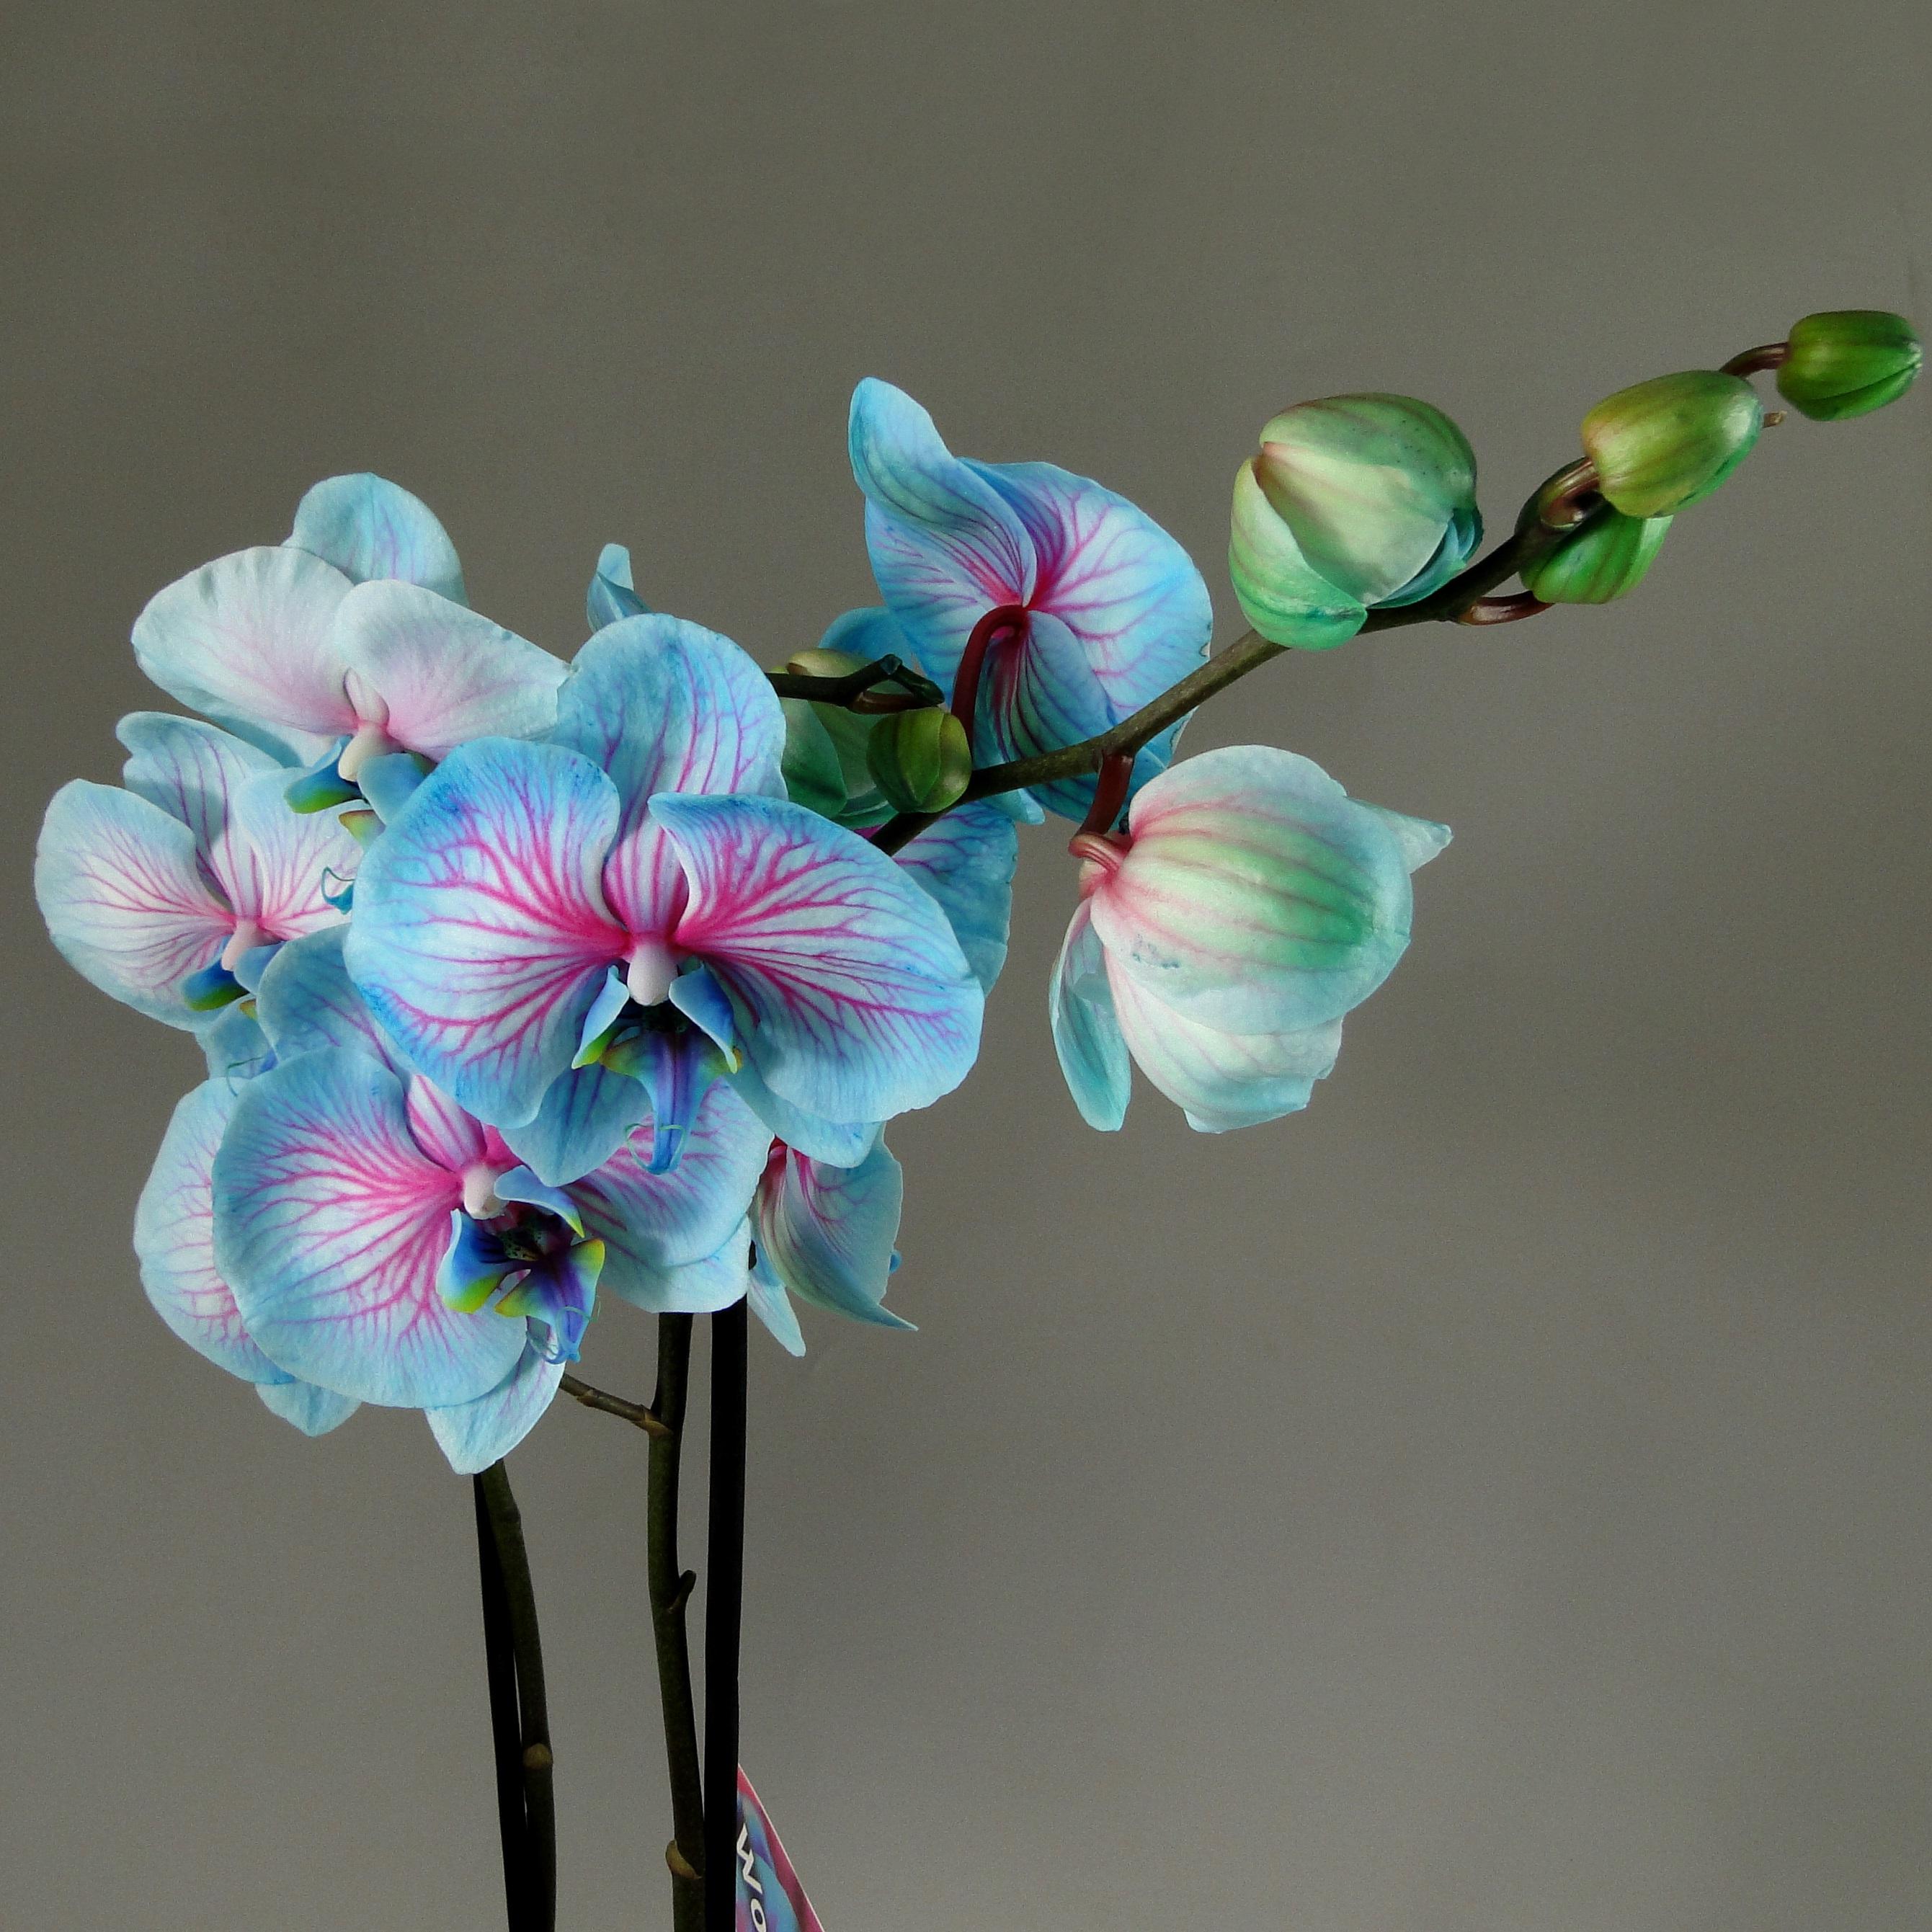 Фаленопсис синий (голубой) с розовым